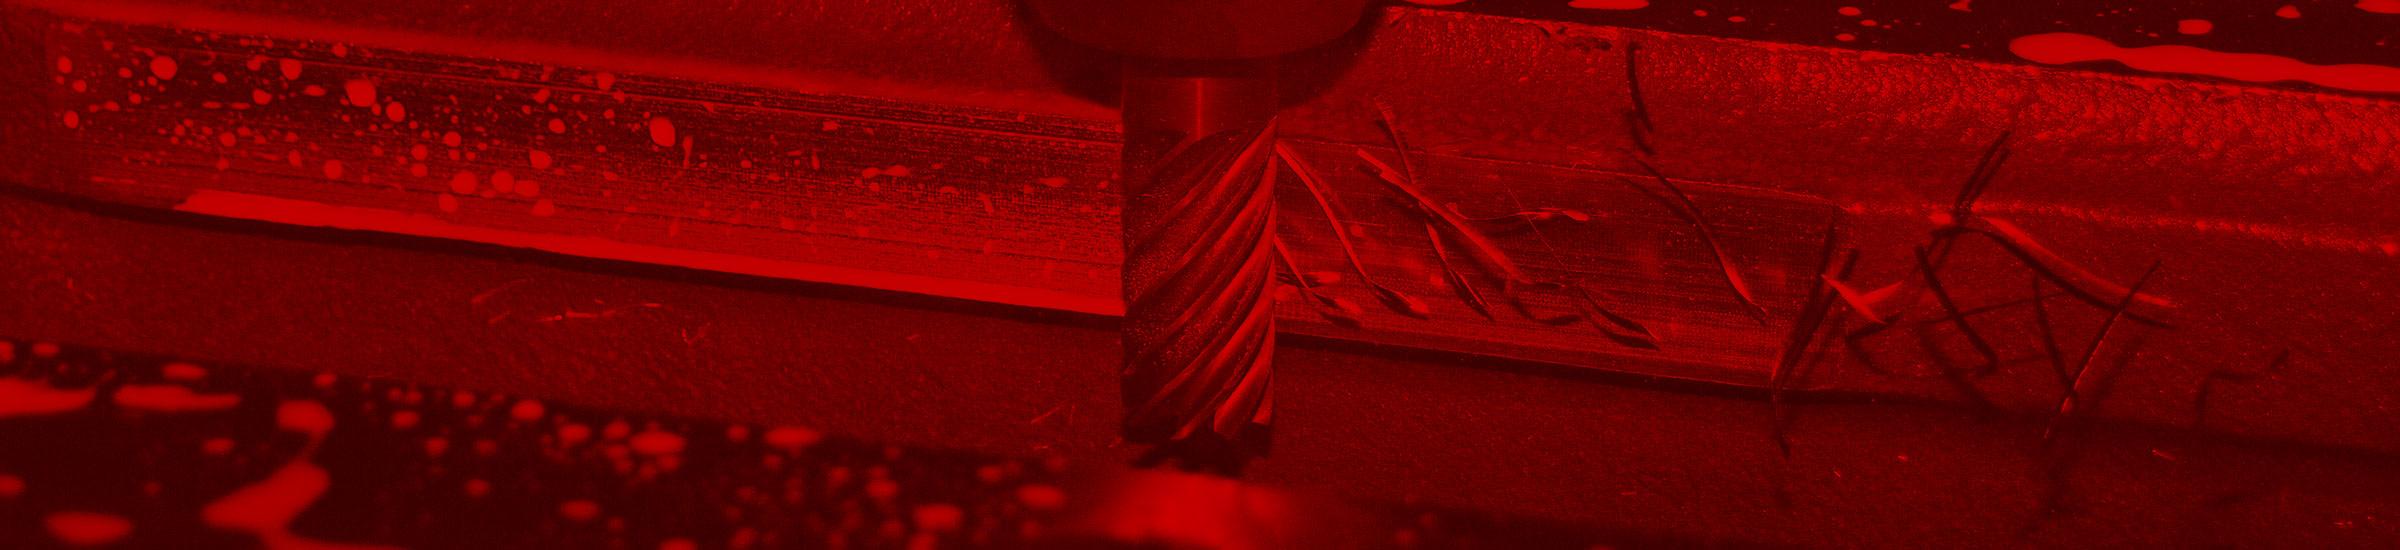 precision-sheet-metal-work